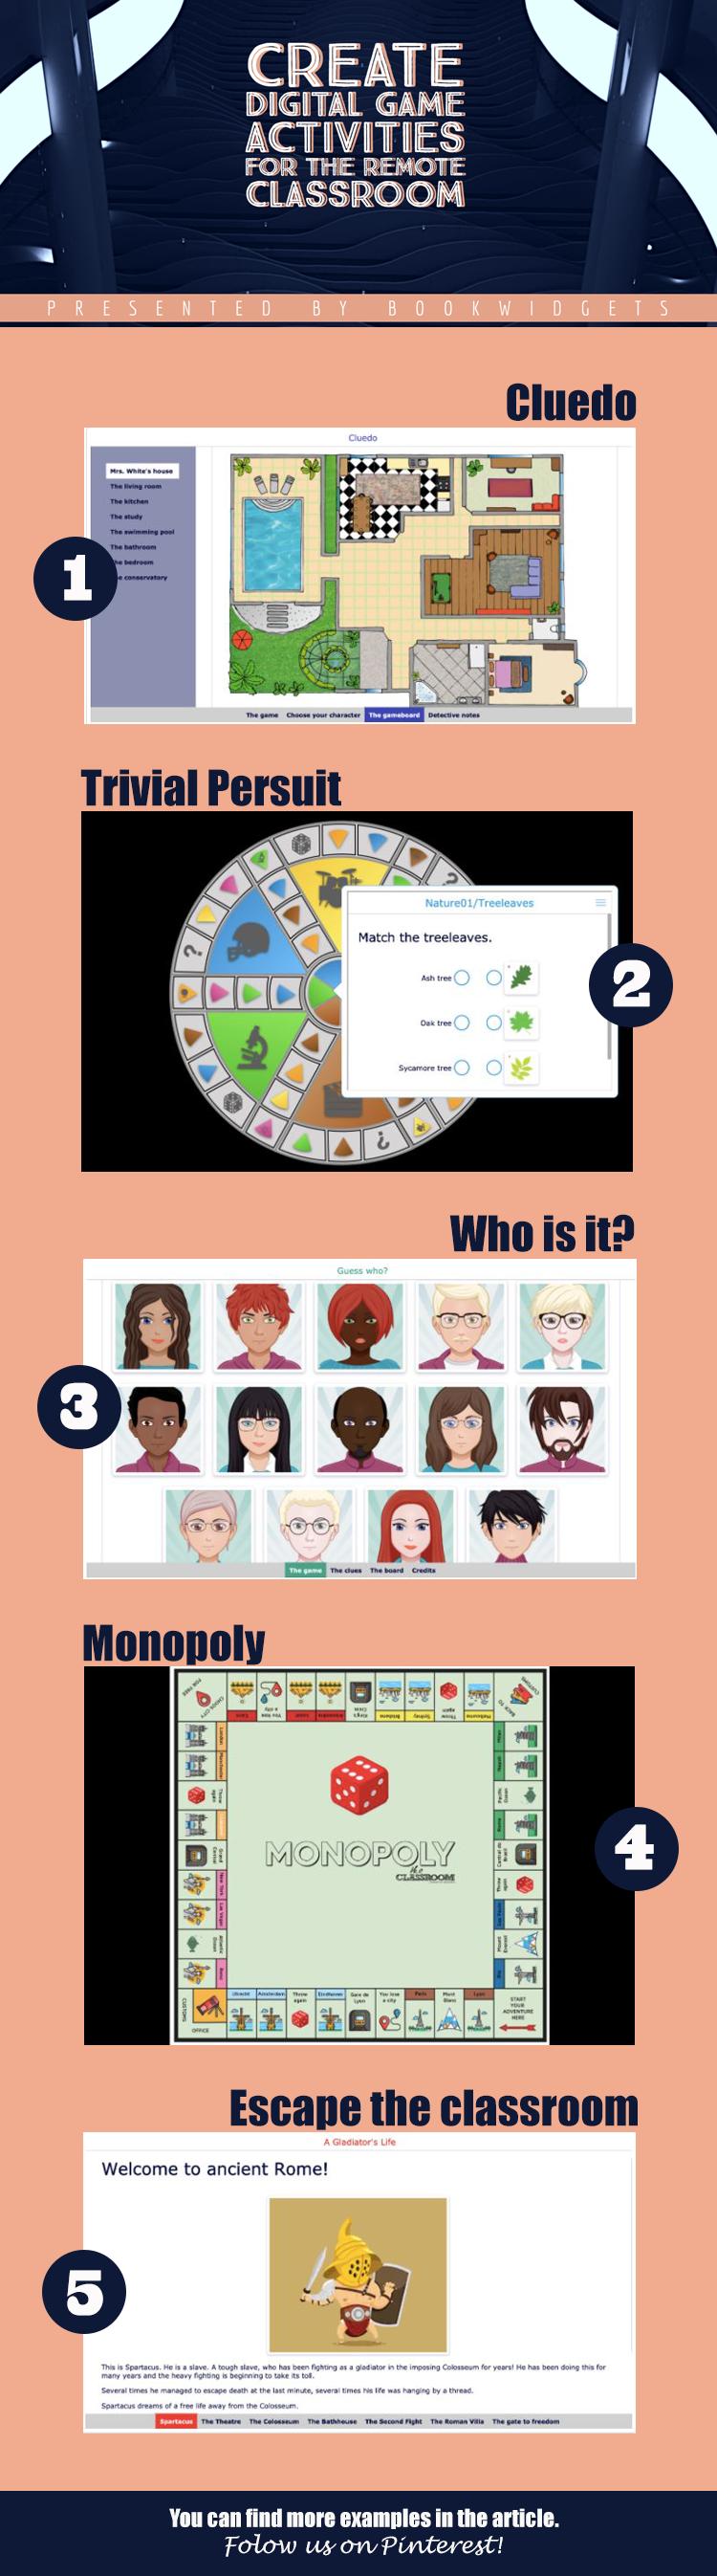 Create digital game activities